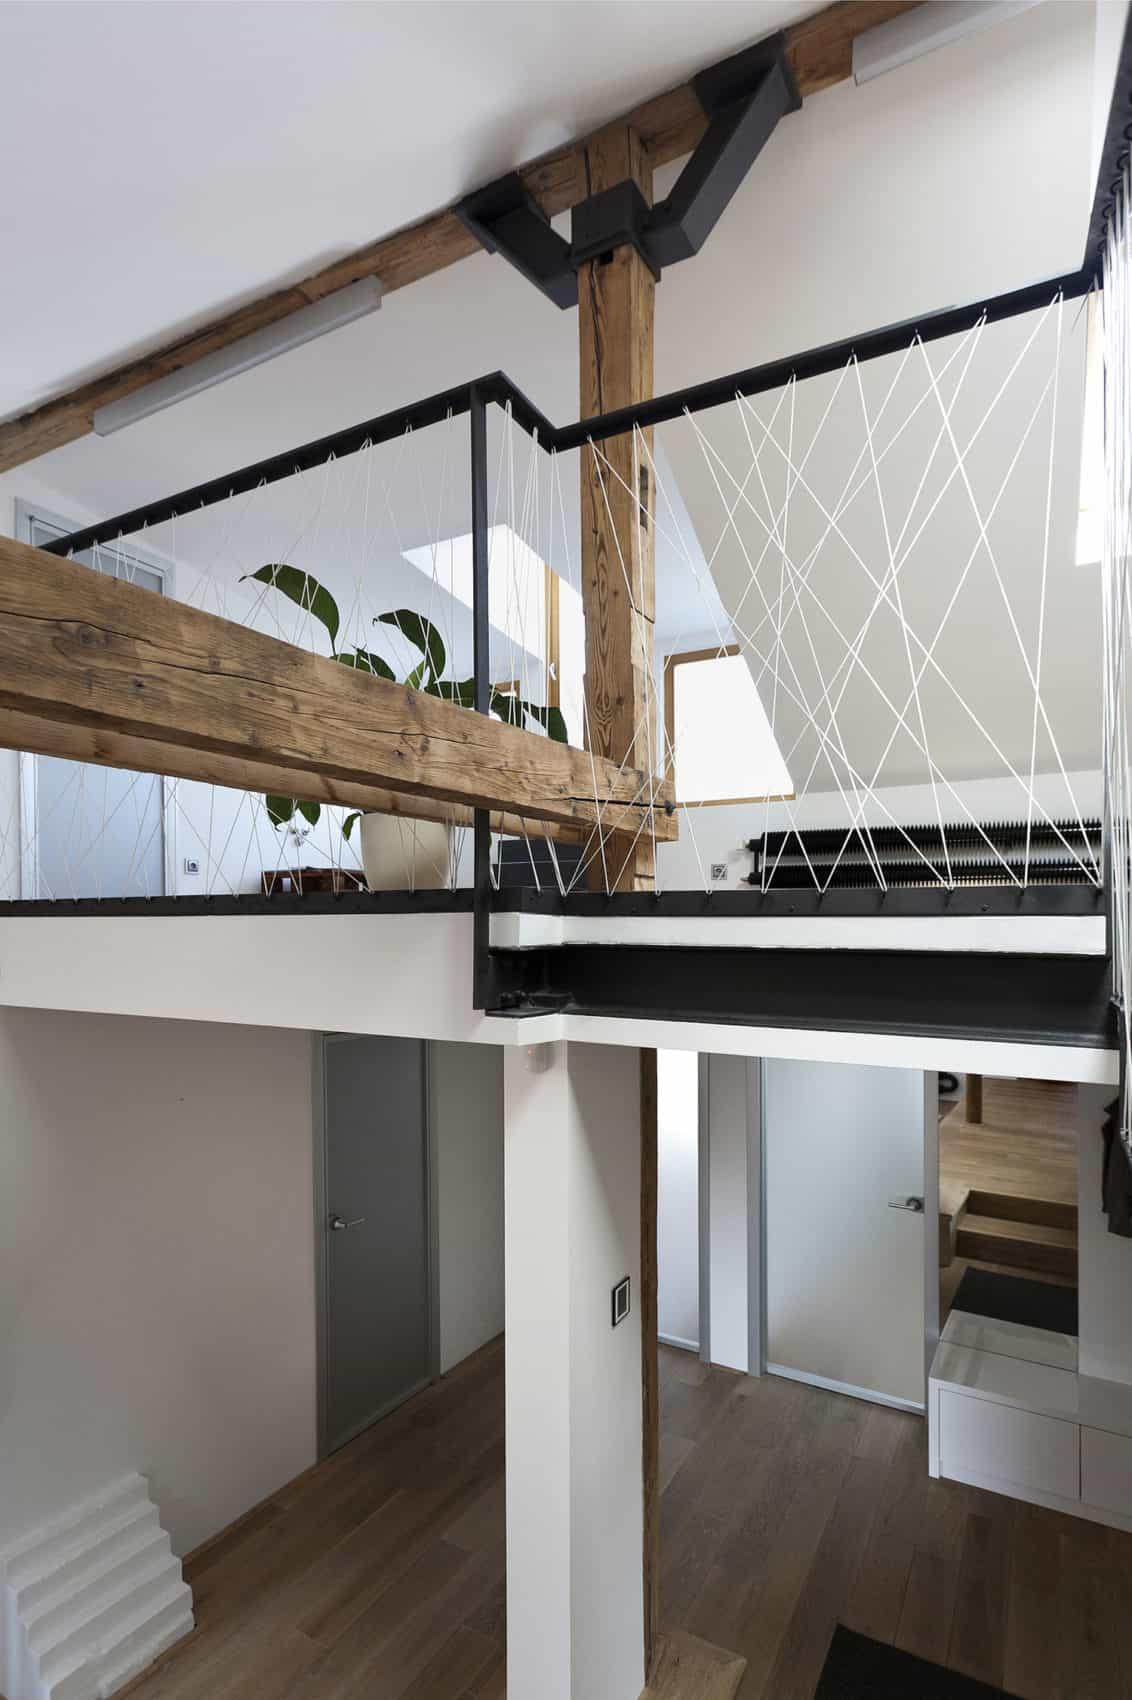 Attic Loft Reconstruction by B² Architecture (10)